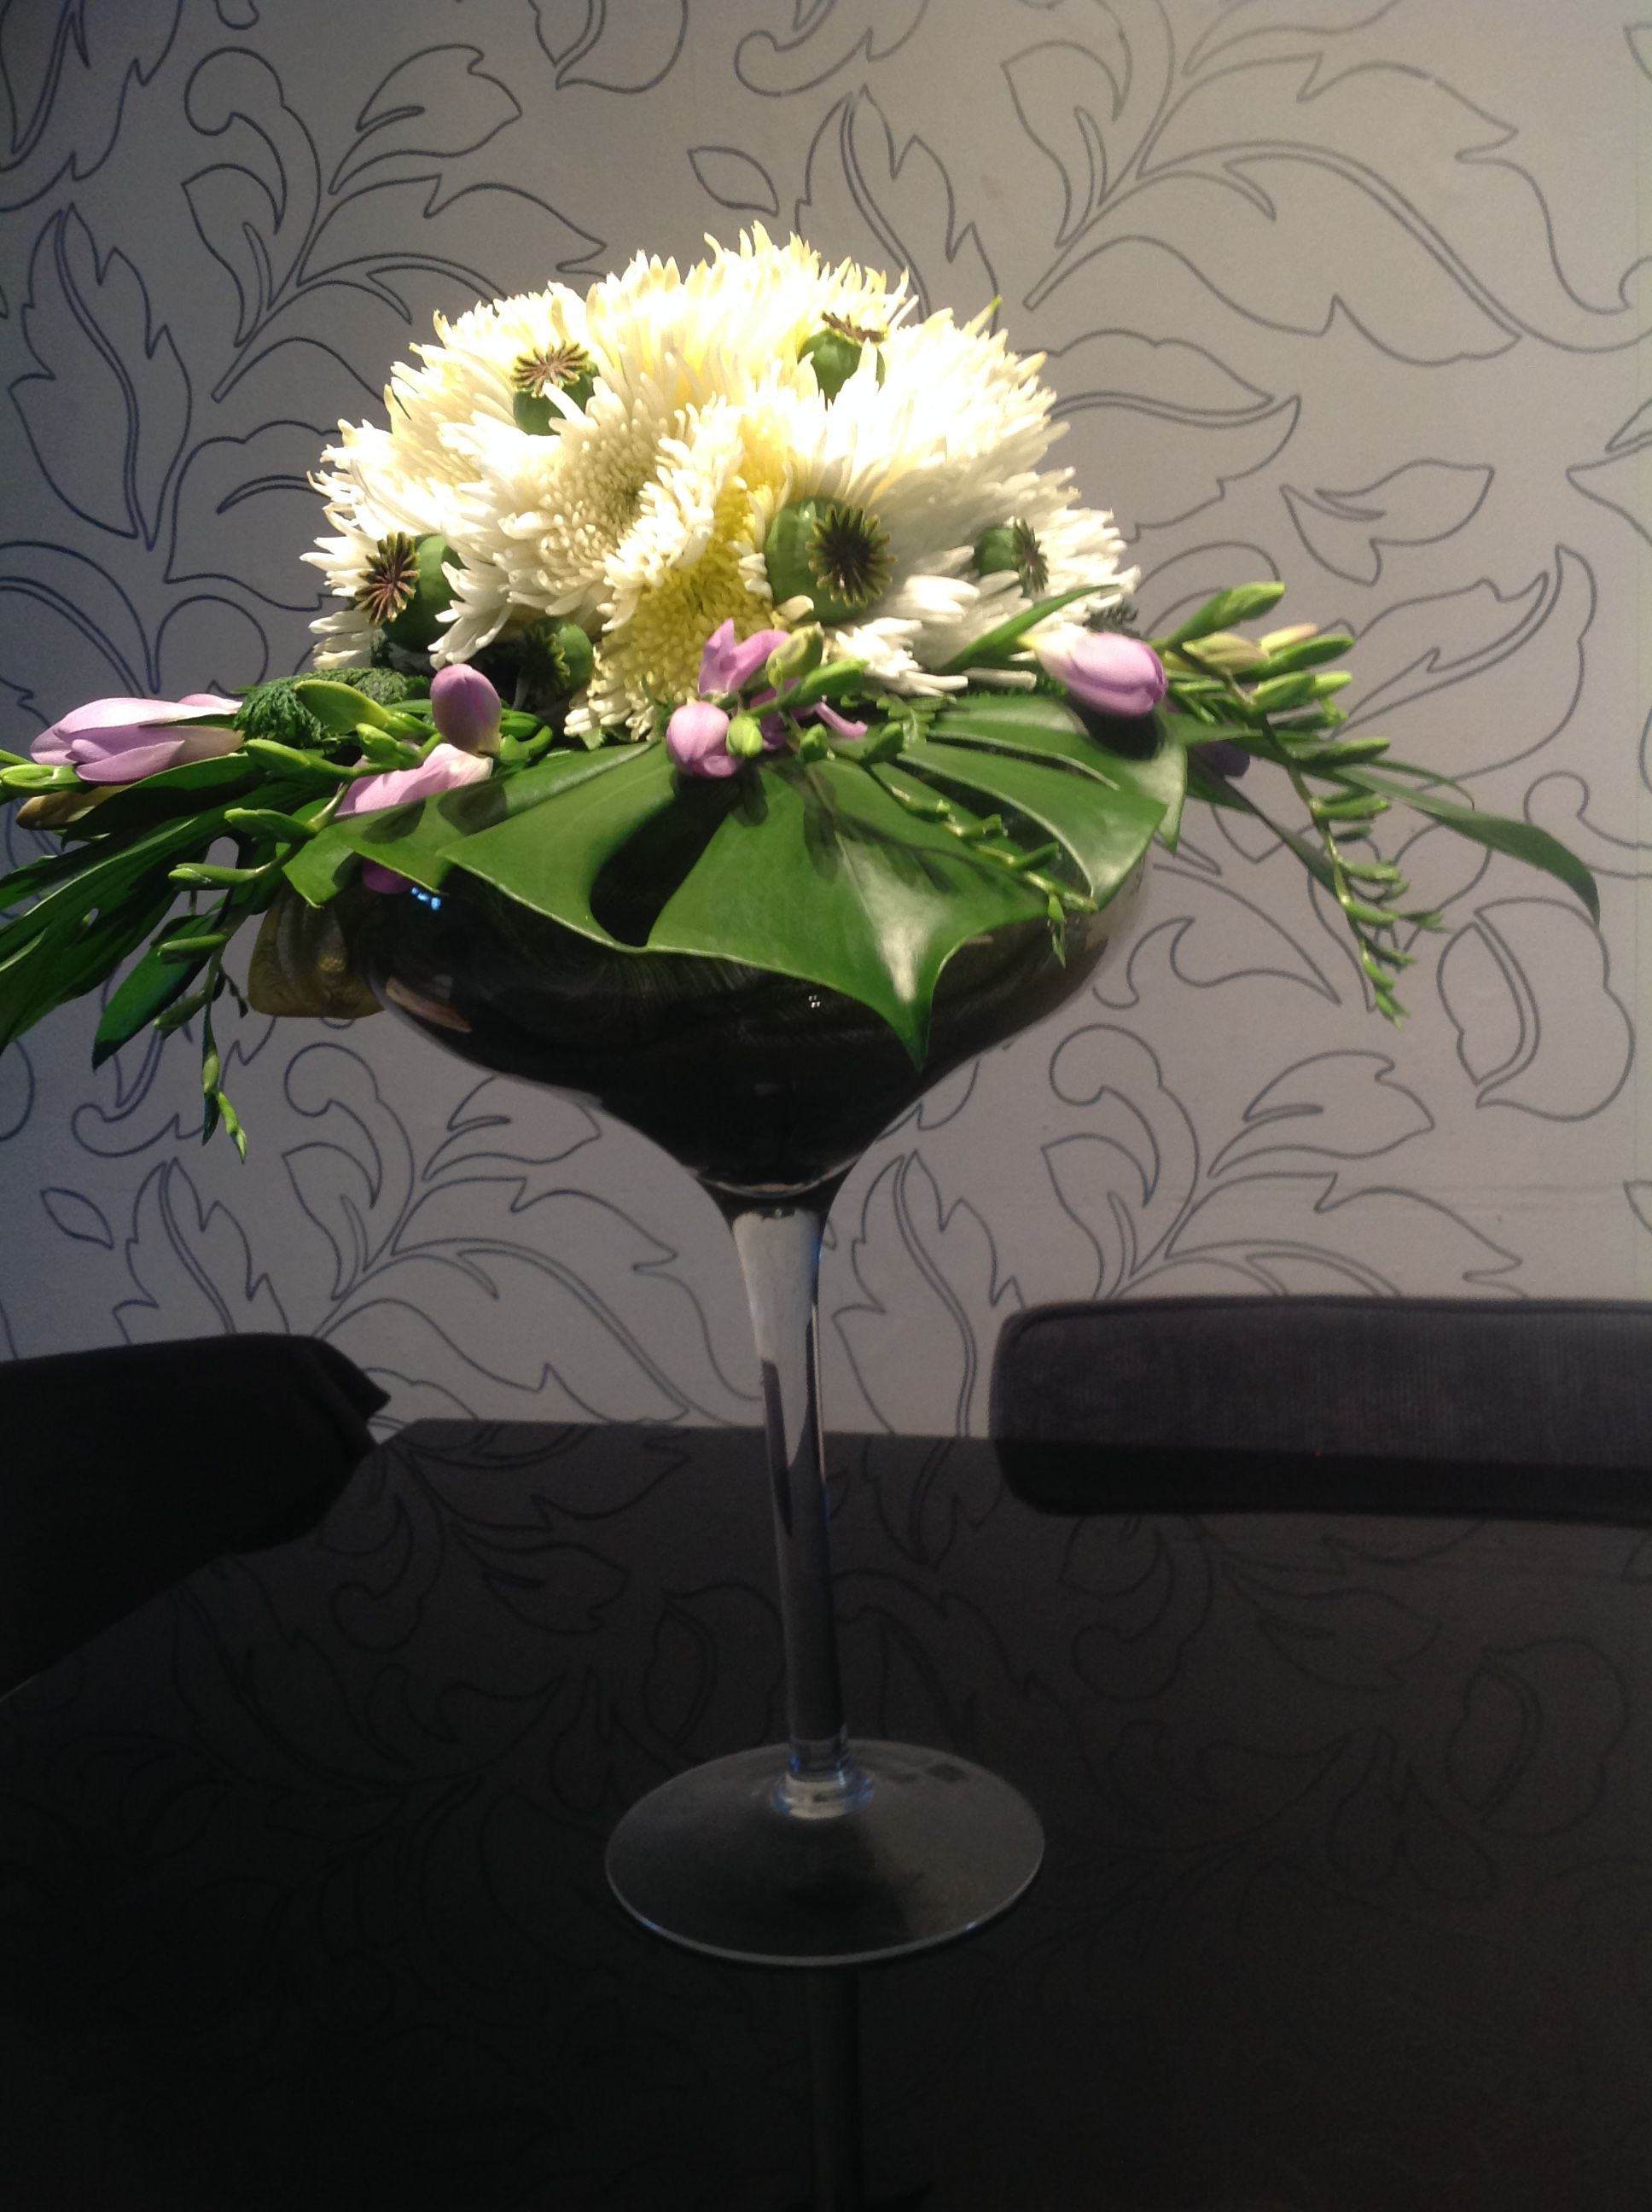 Pin by lesly mendoza on arreglos florales pinterest flower flower arrangement floral arrangements martini vase flower arrangements flower vases floral arrangement floral wreath jar floridaeventfo Images